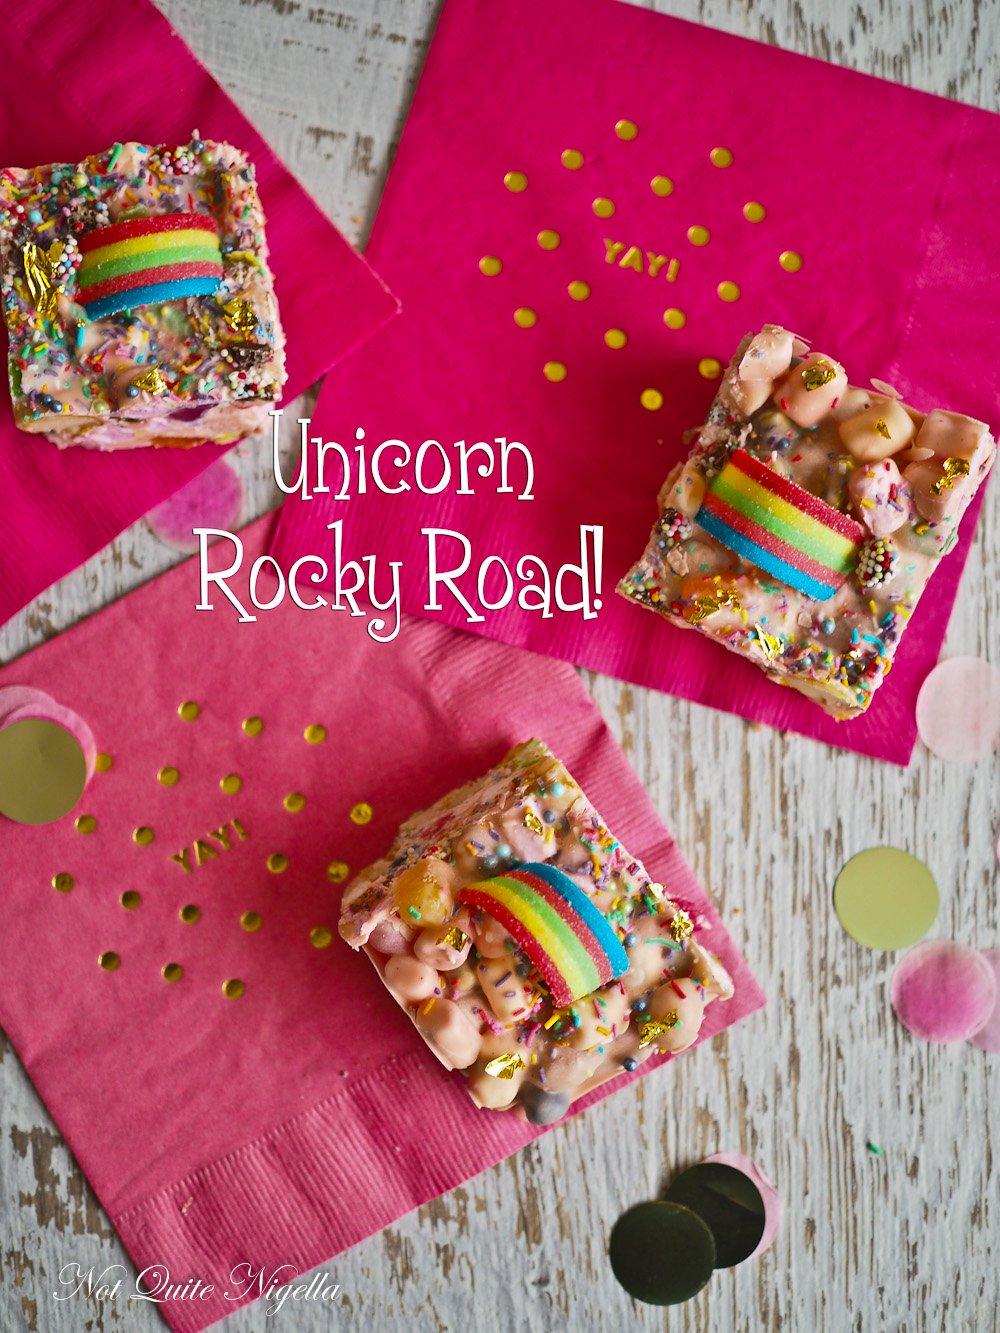 Unicorn Rocky Road